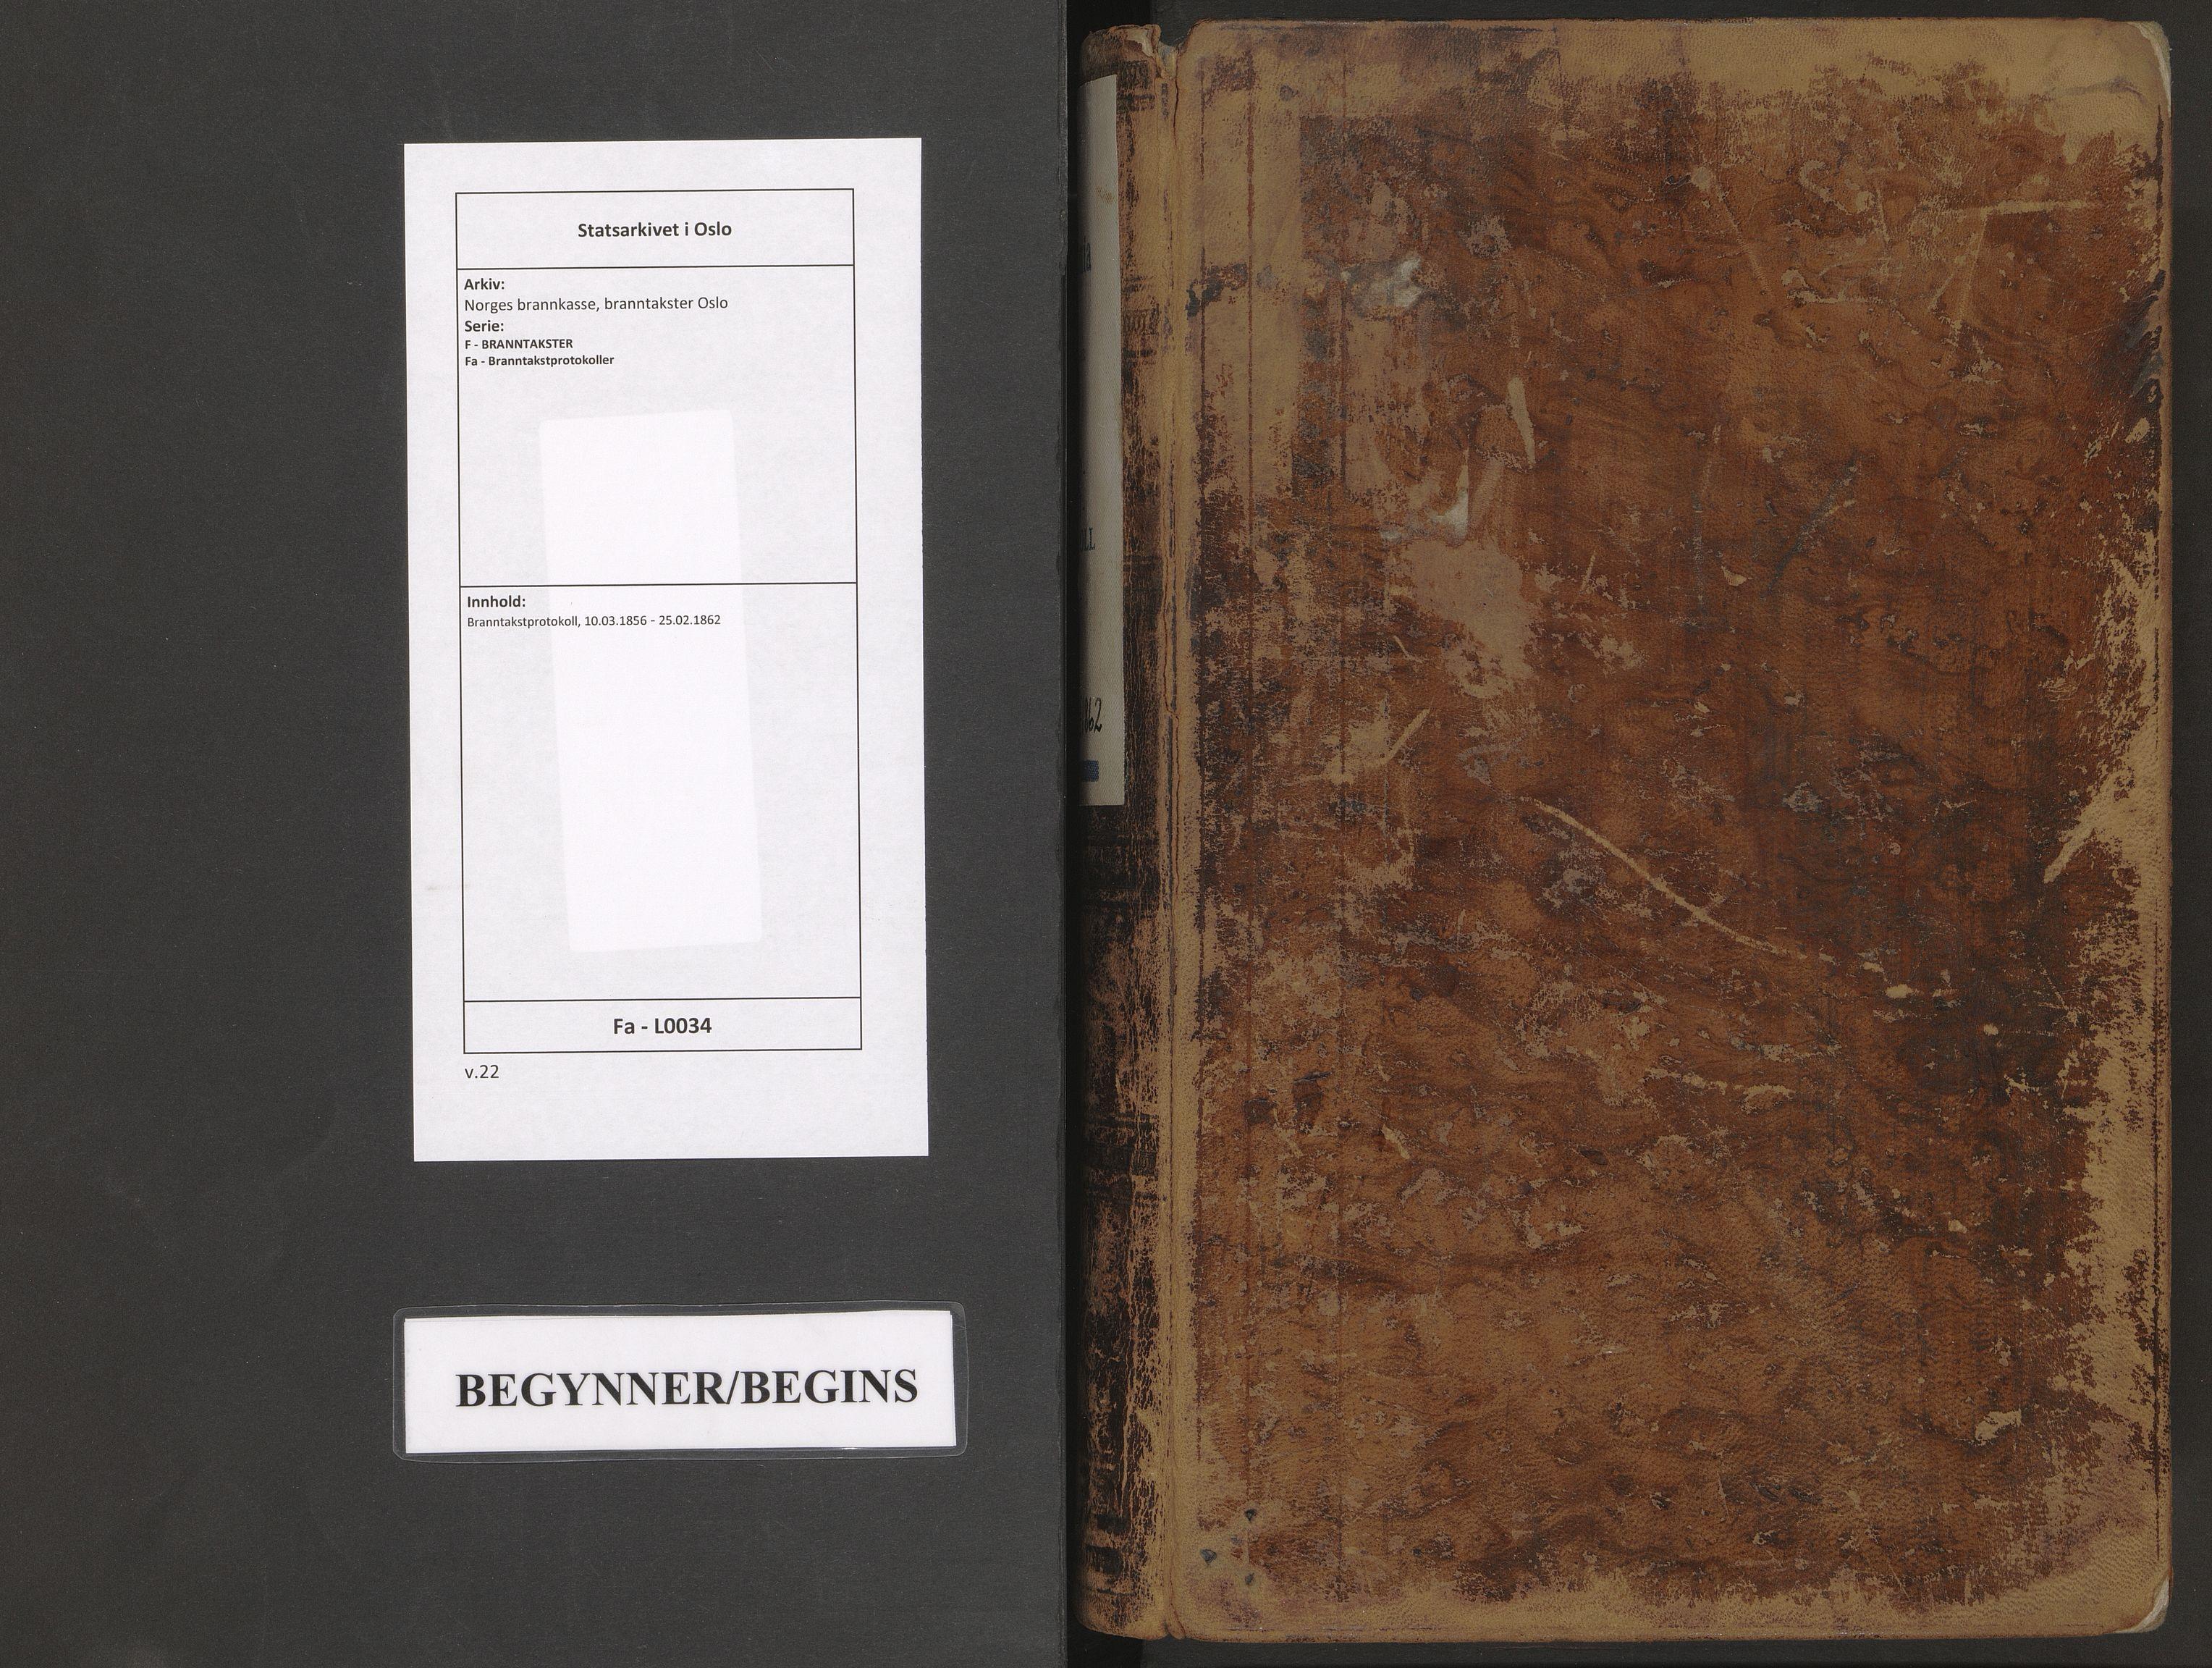 SAO, Norges brannkasse, branntakster Oslo, F/Fa/L0034: Branntakstprotokoll, 1856-1862